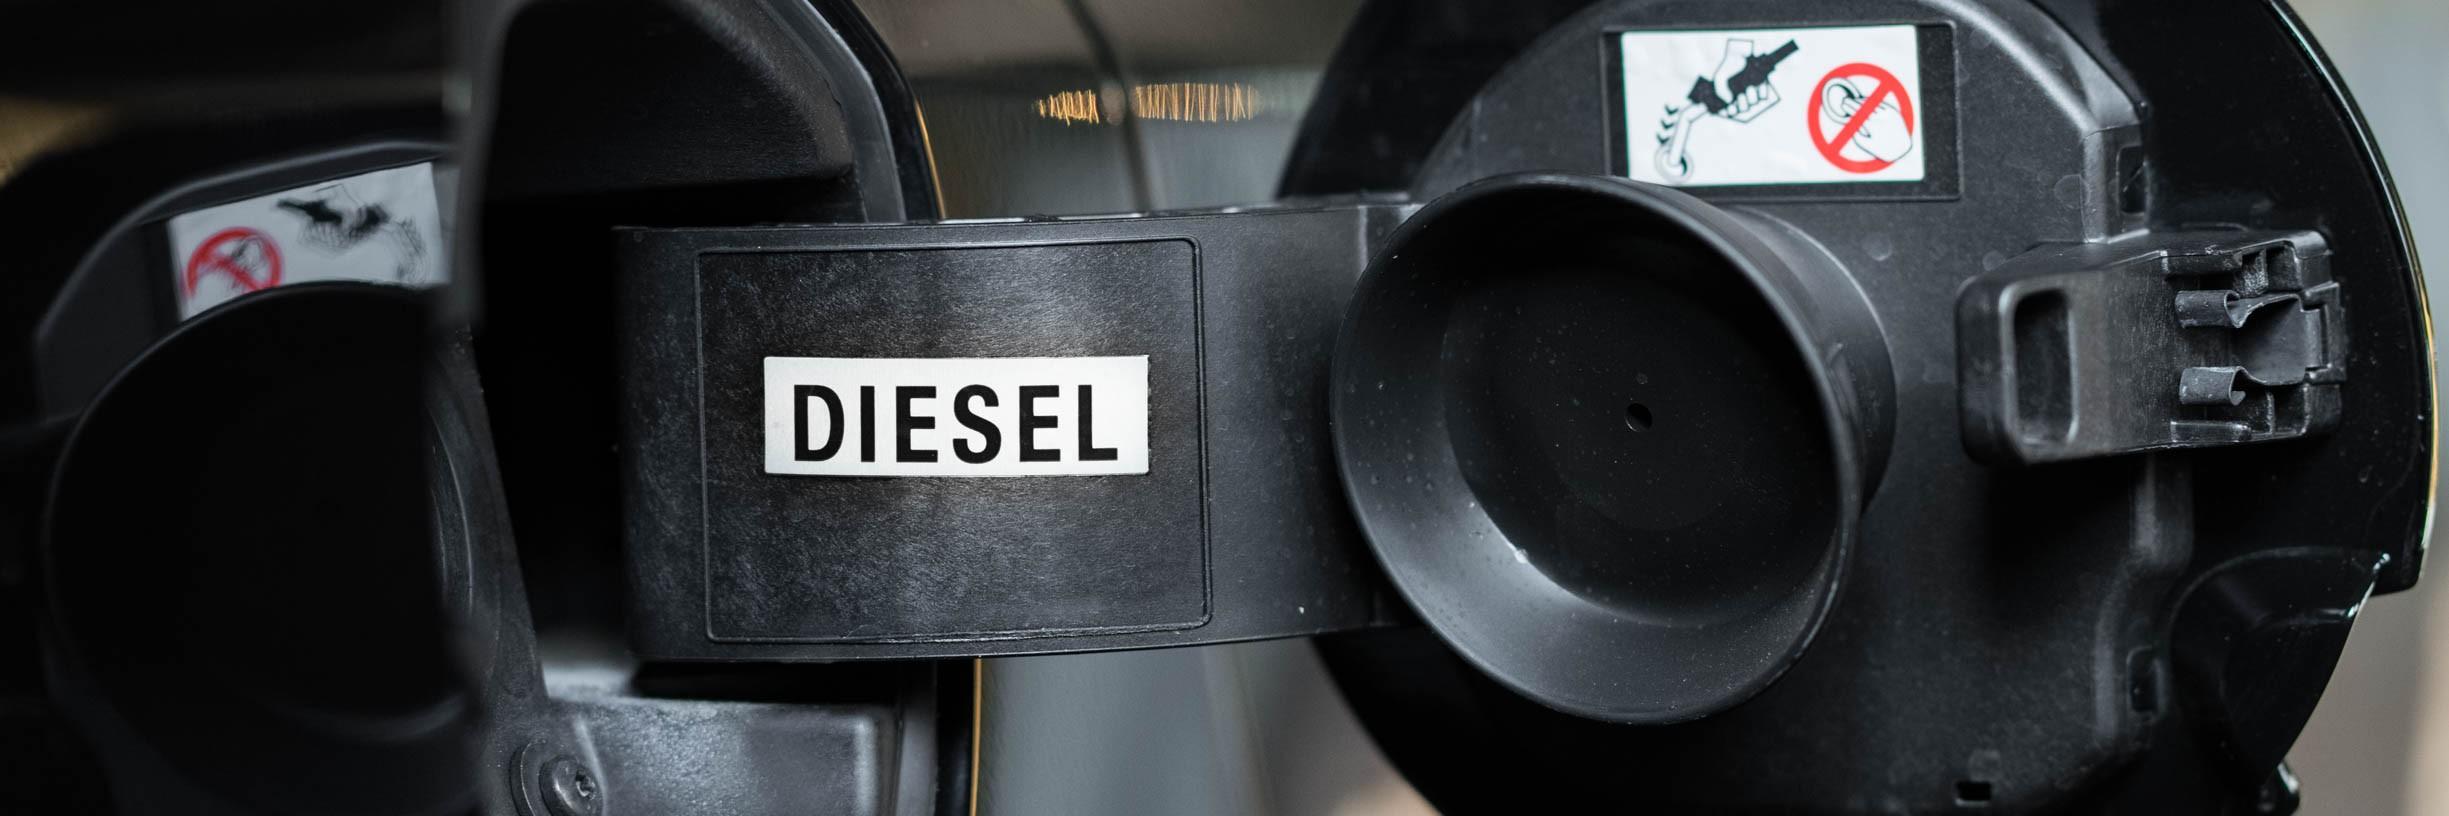 Diesel vs Benzine